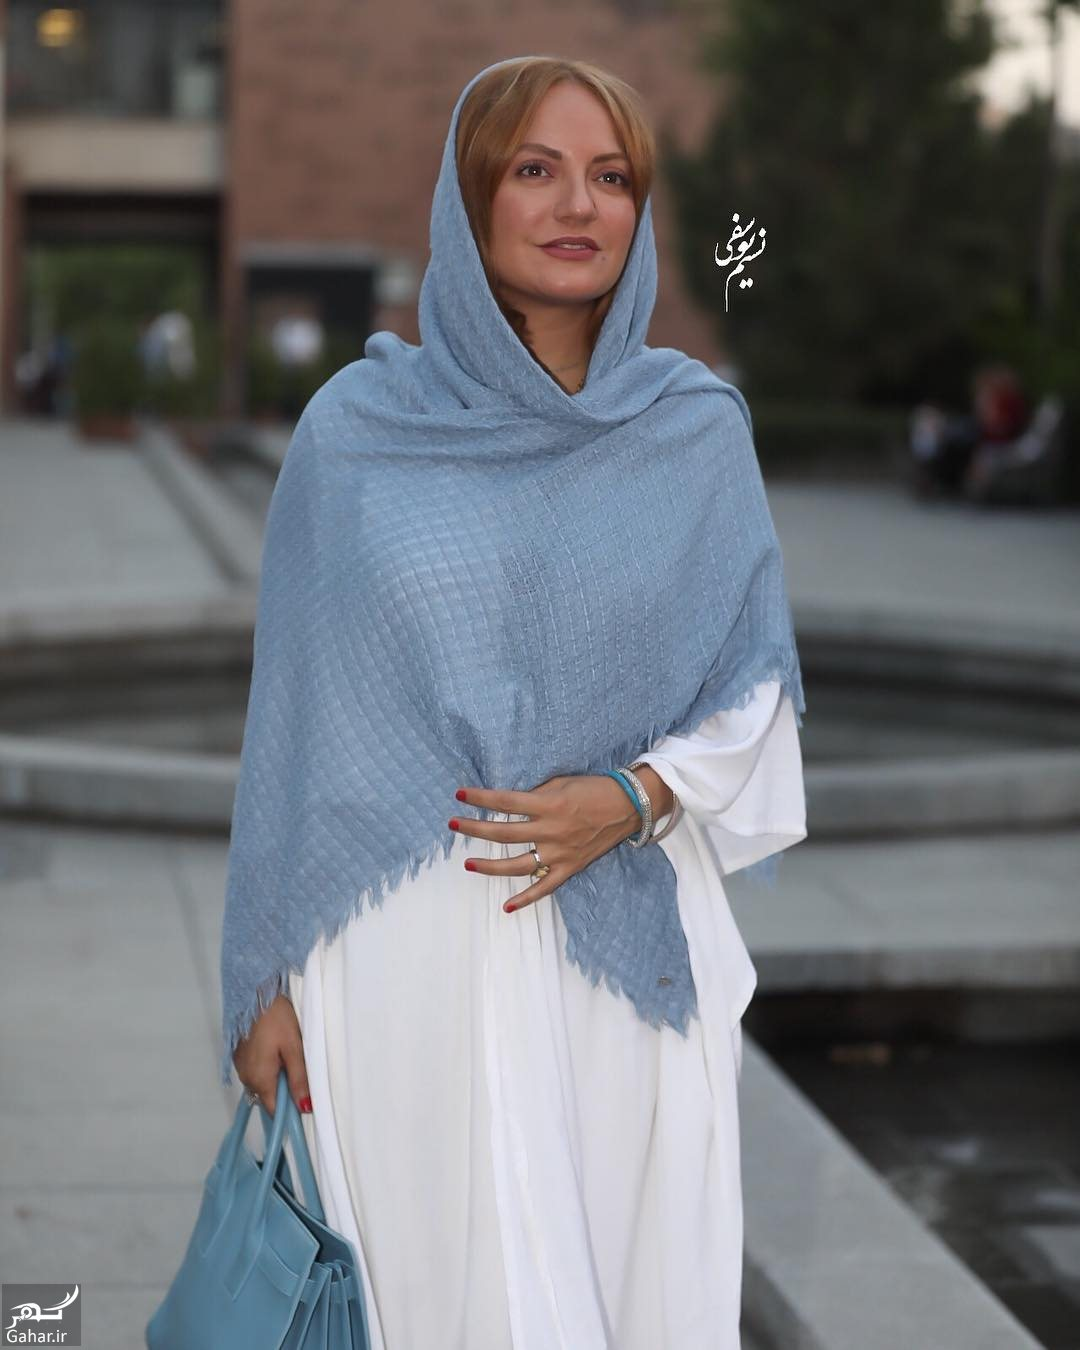 274023 Gahar ir عکس های جدید بازیگران در مراسم جشن عکاسان سینمای ایران